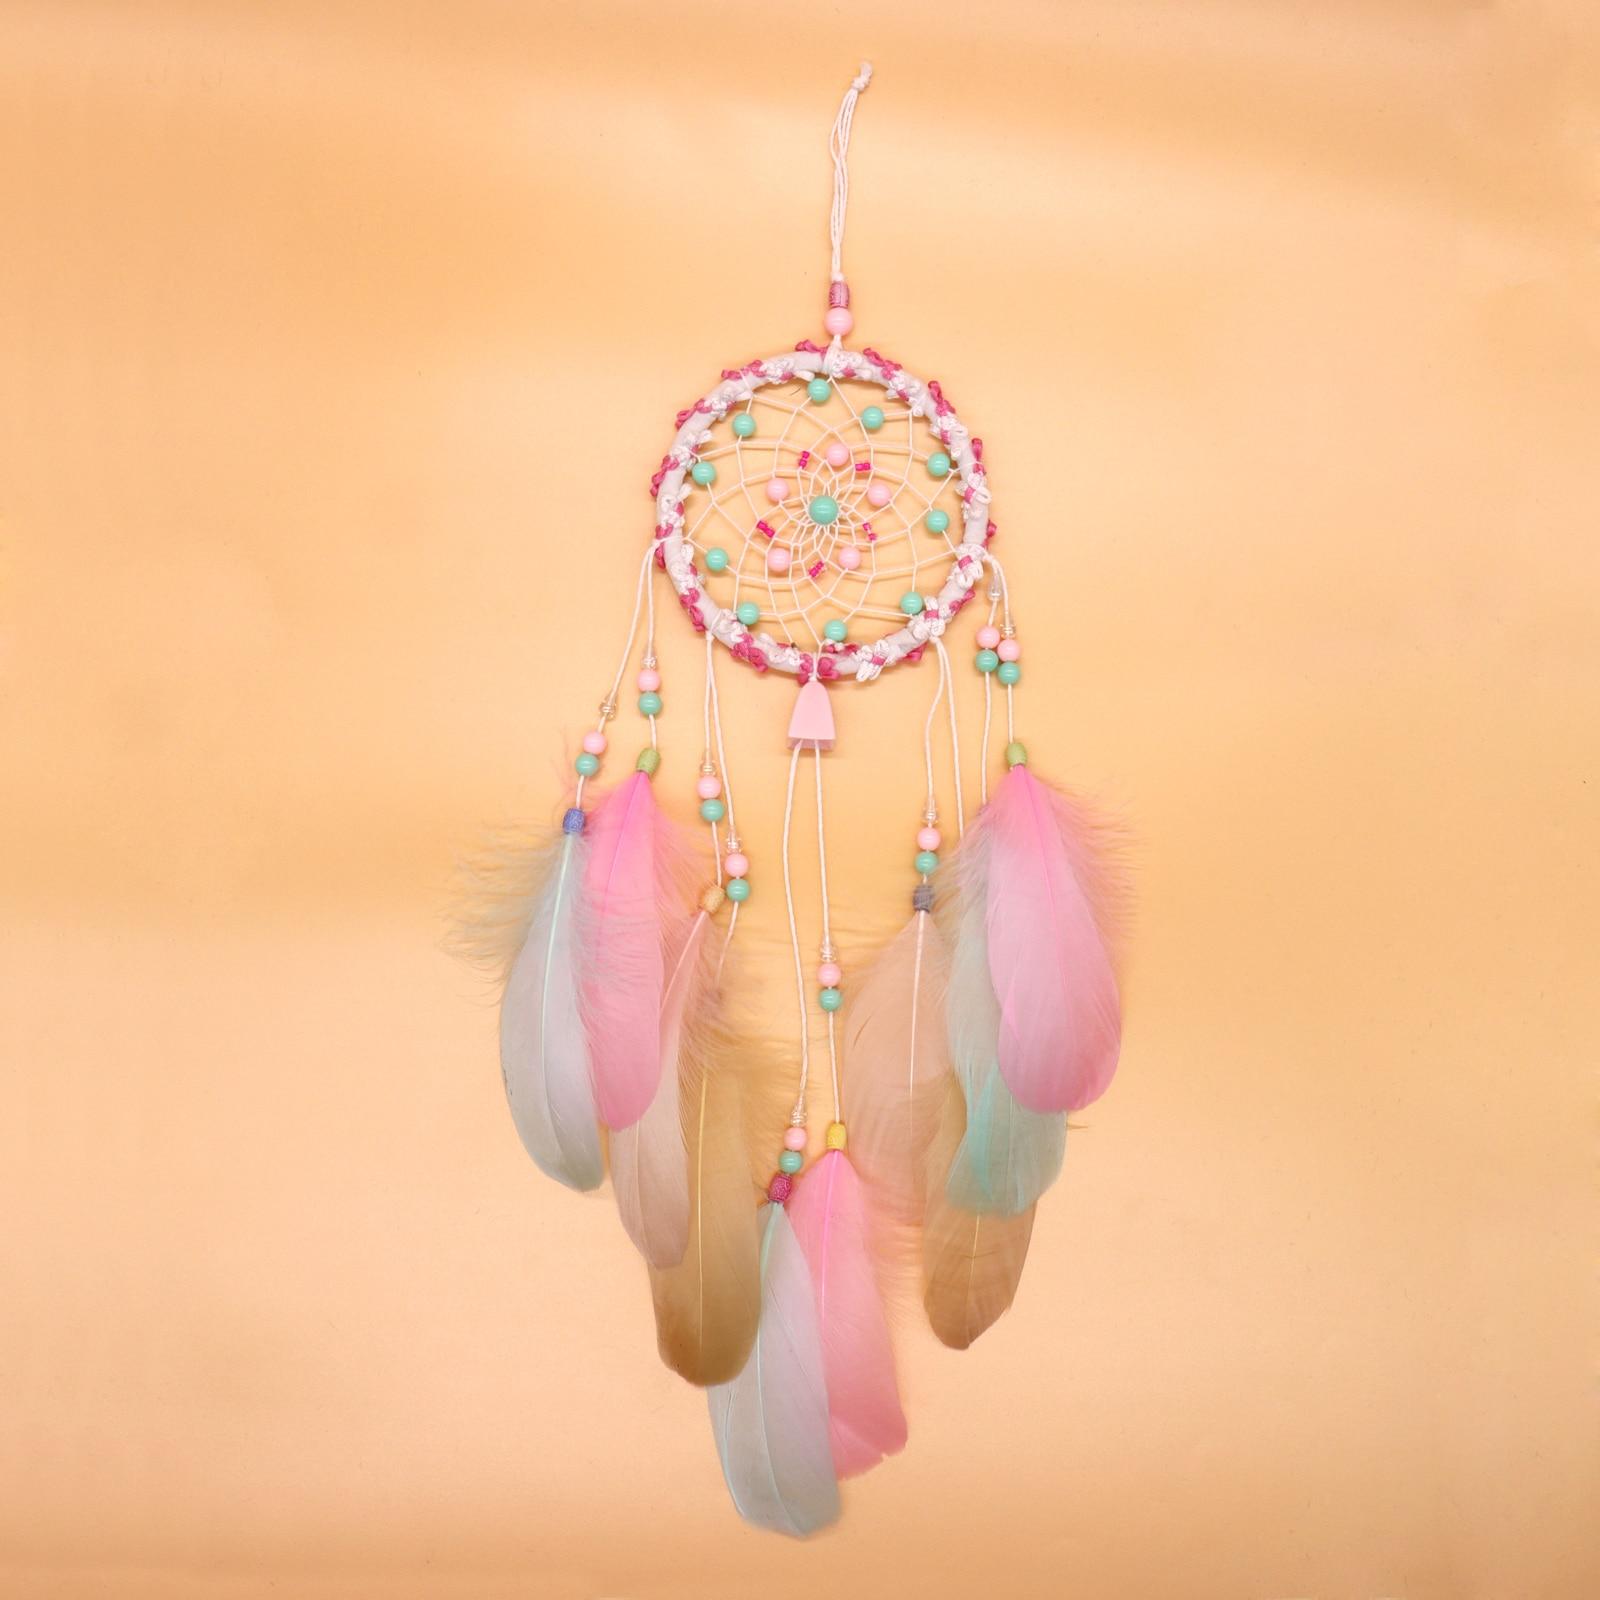 1 Stks Boho Dream Catchers Catcher Handgemaakte Veren Muur Opknoping Boho Diy Bruiloft Decoratie Festival Craft Gift Up-To-Date Styling